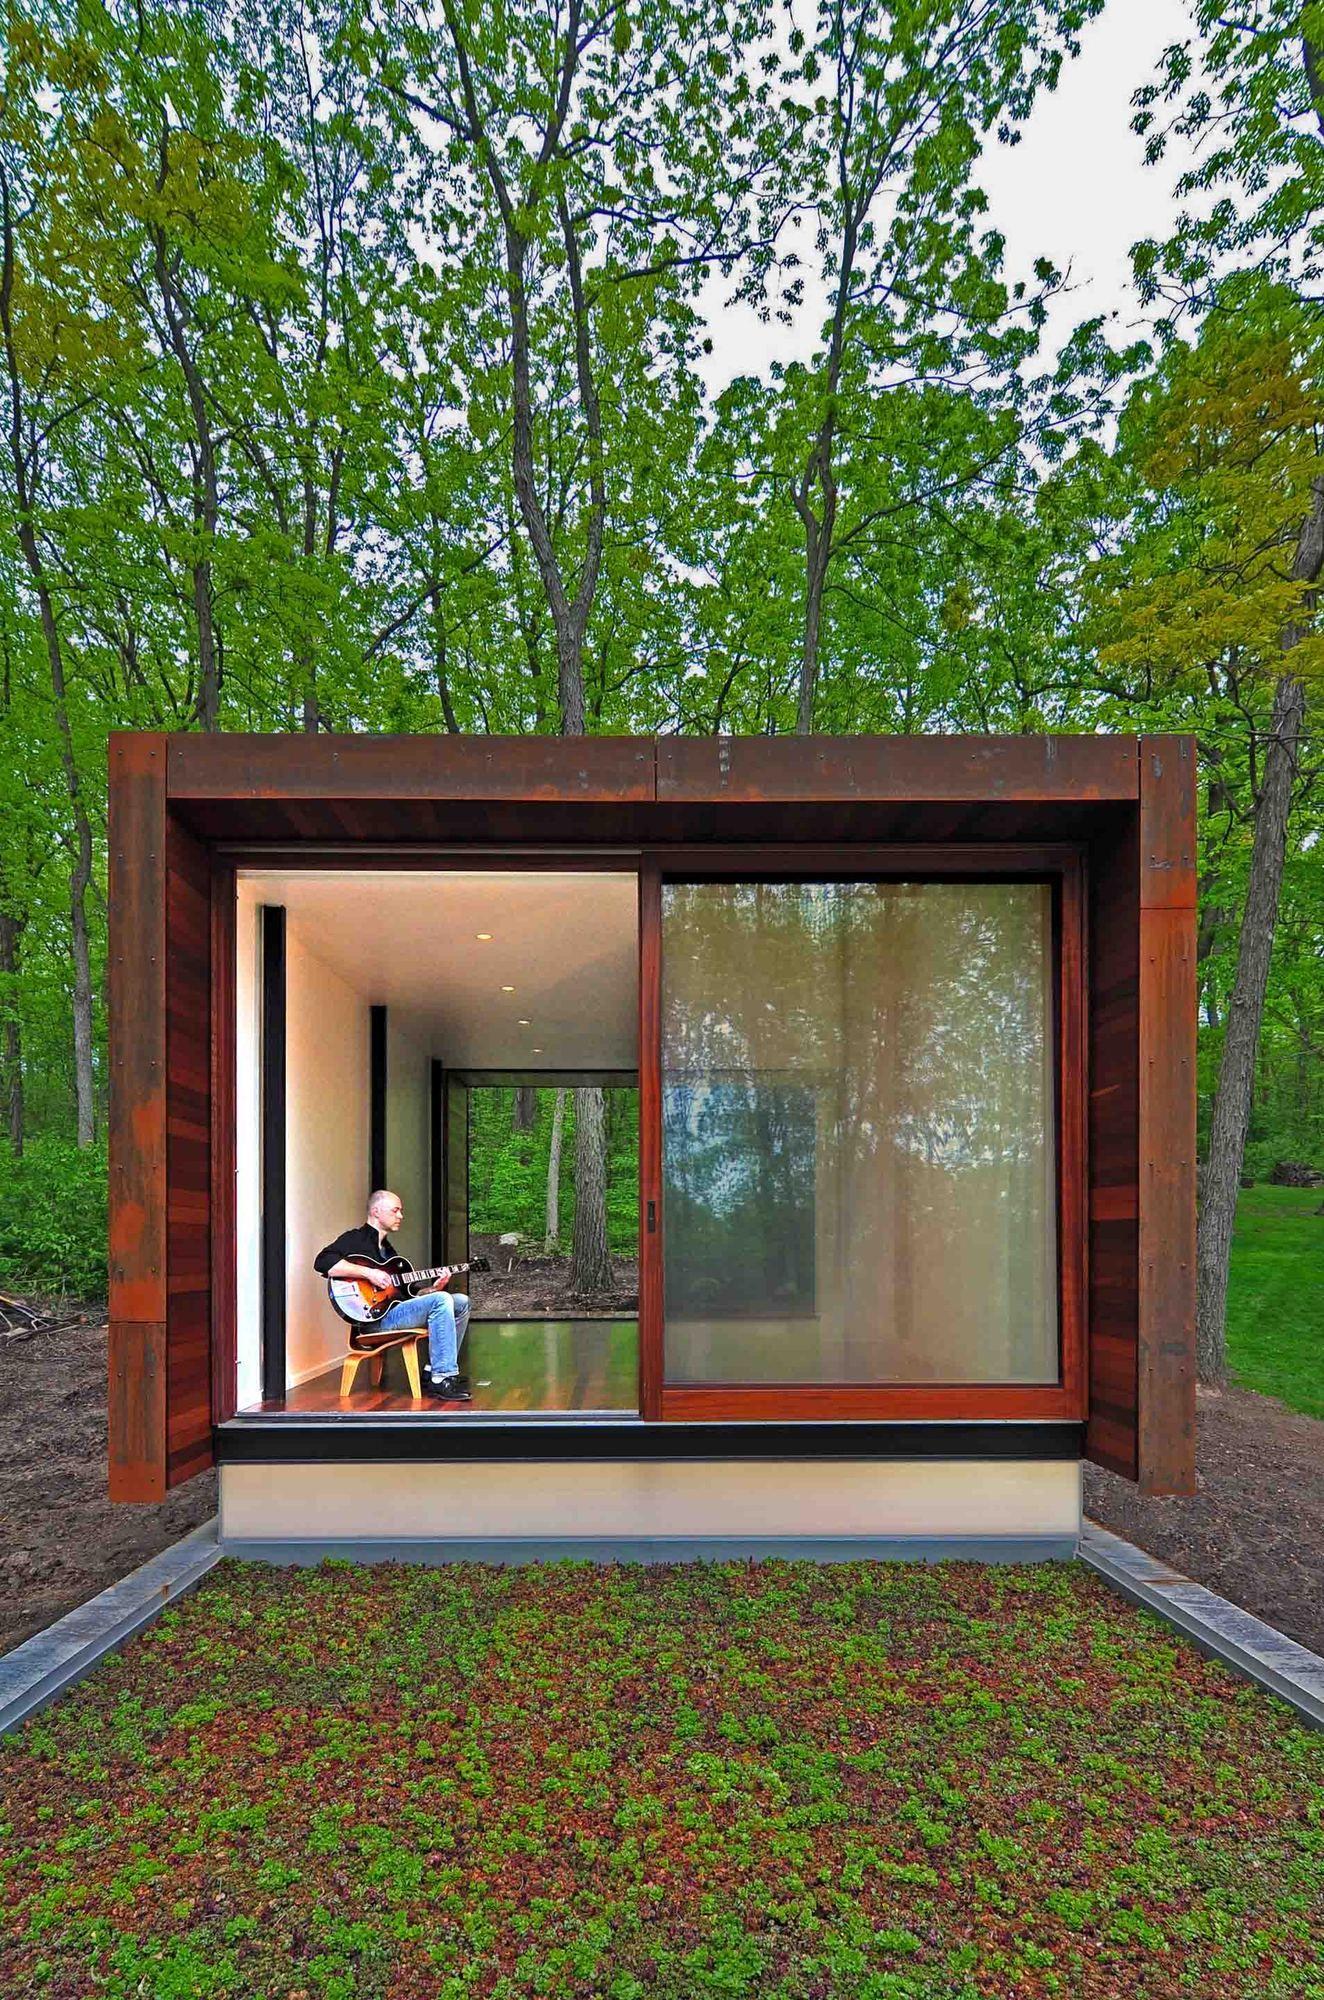 5047a28728ba0d0c5600008b_studio-for-a-composer-johnsen-schmaling-architects_studio_002-small.jpg 1324×2000 pikseliä